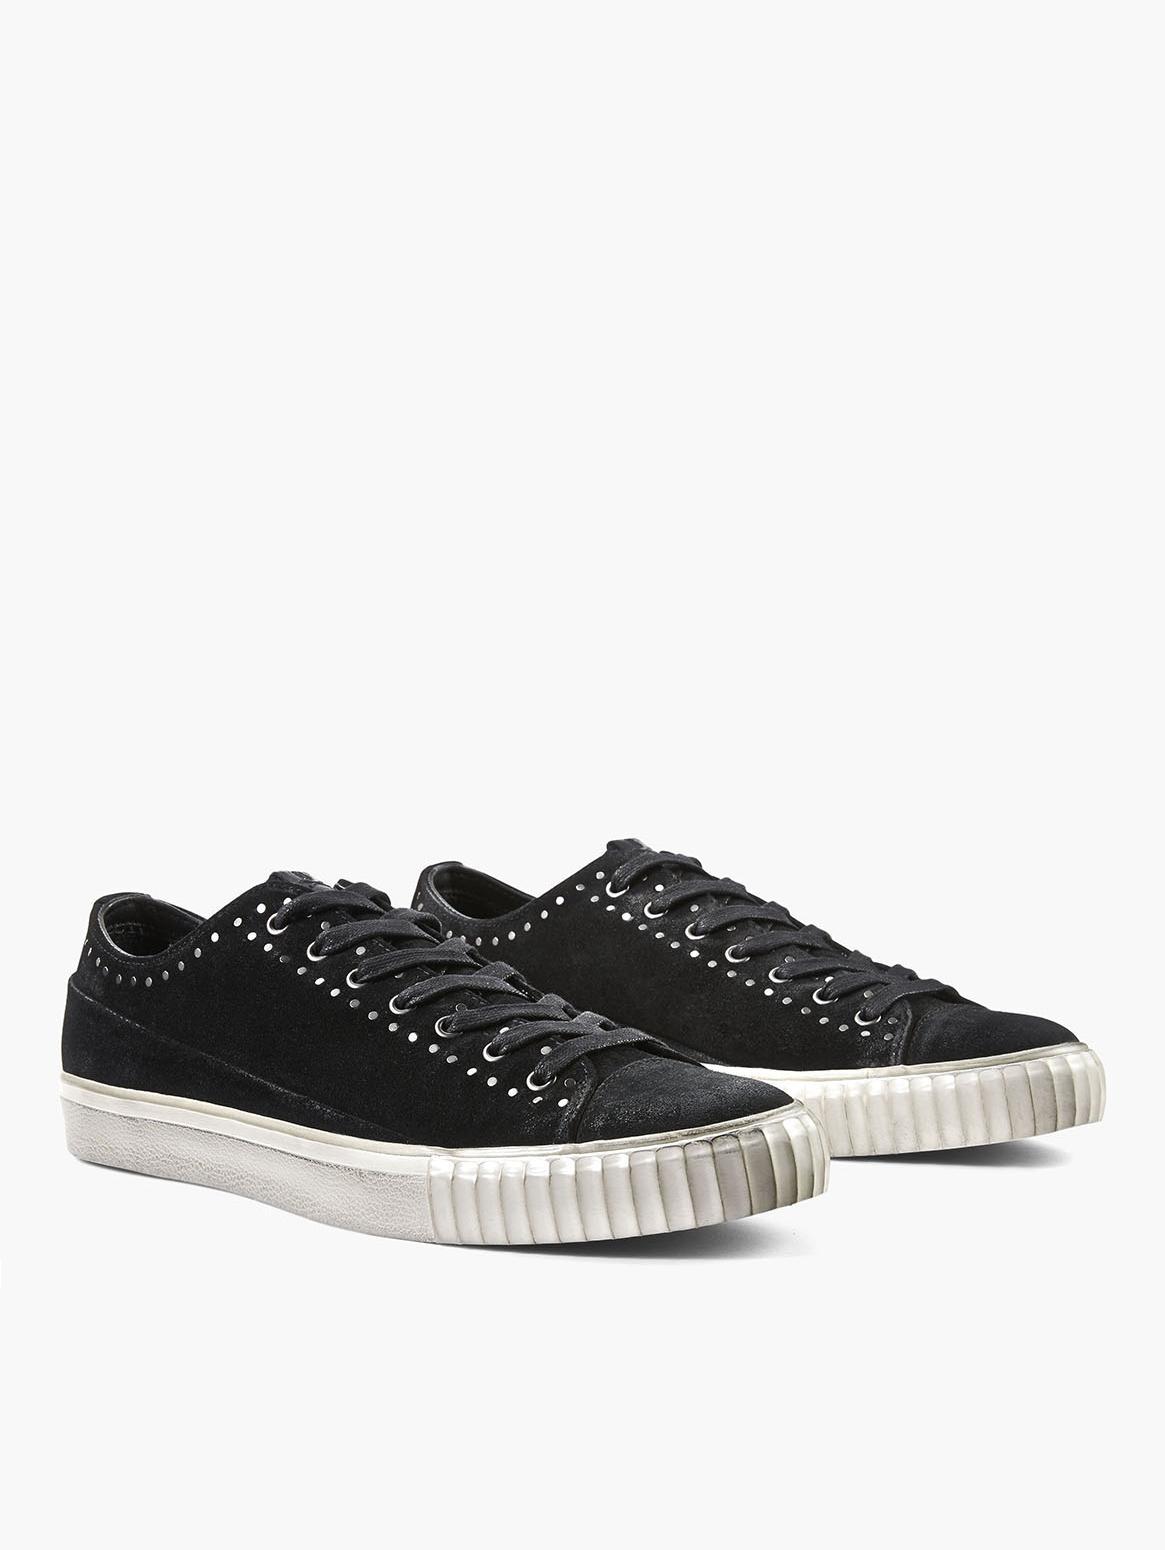 John Varvatos Black Suede Studded Low-Top Sneakers